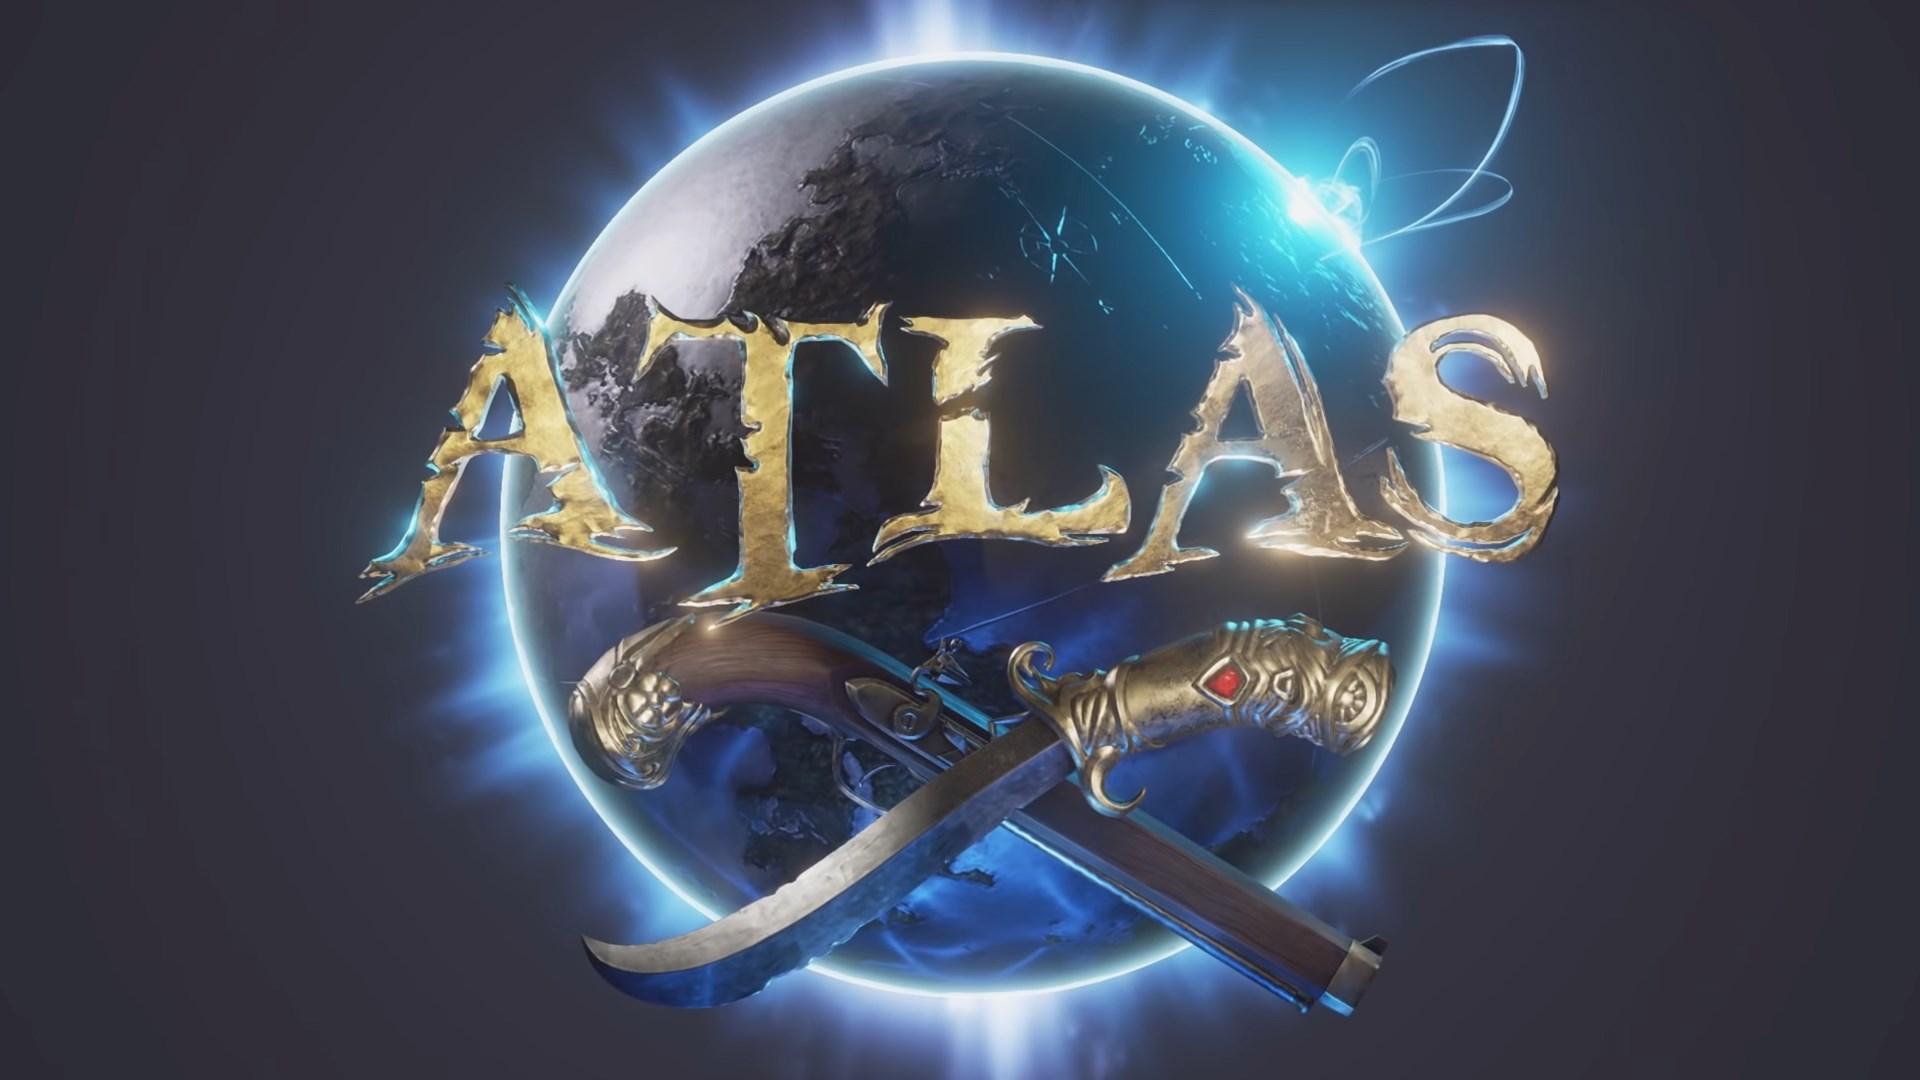 《Atlas》10.0升级档周一发布:吃屎之后就会死